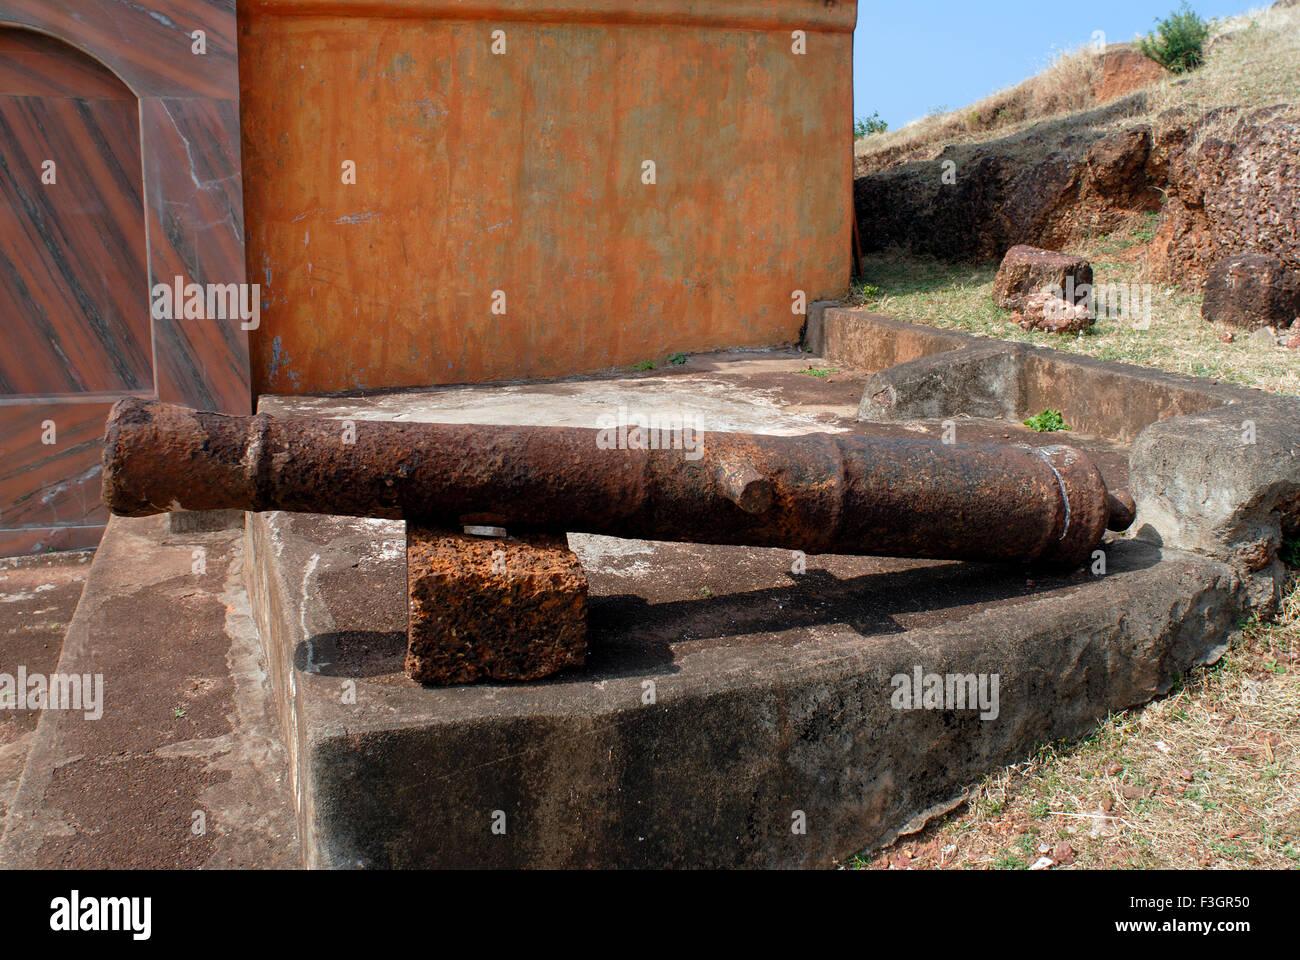 A cannon gun at Vijaydurg fort ; District Sindhudurga ; Maharashtra ; India - Stock Image